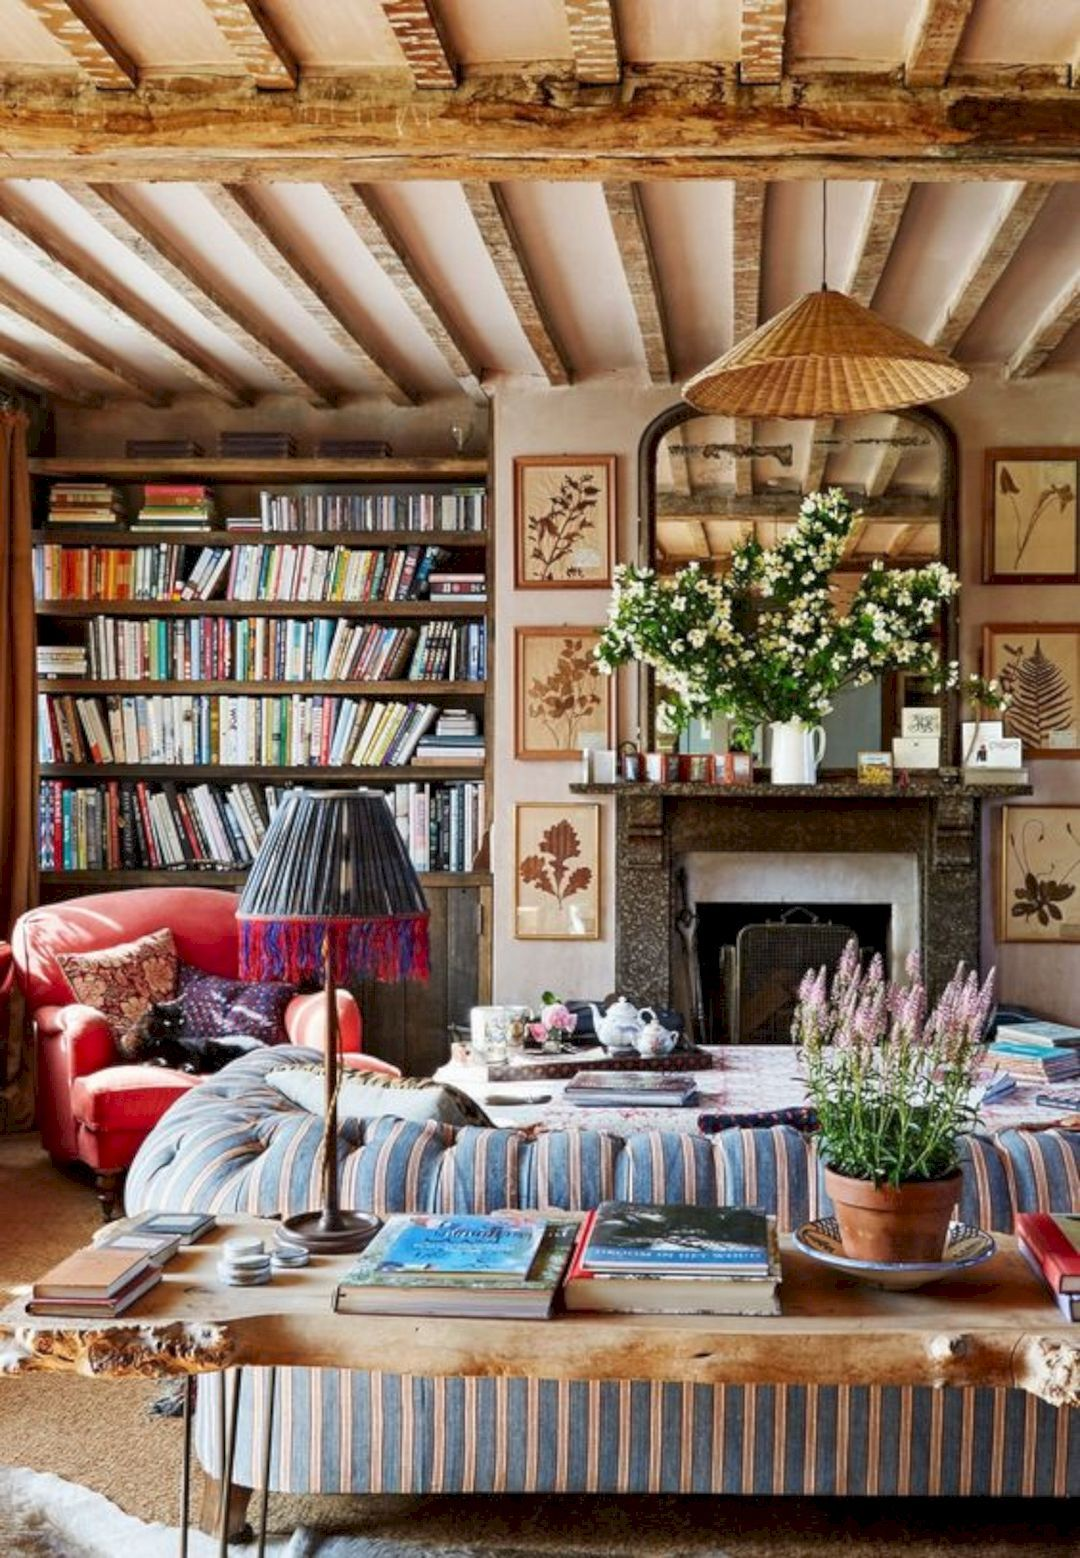 English country home interiors   Brilliant Cottage Interior Design Ideas  Cottage interiors